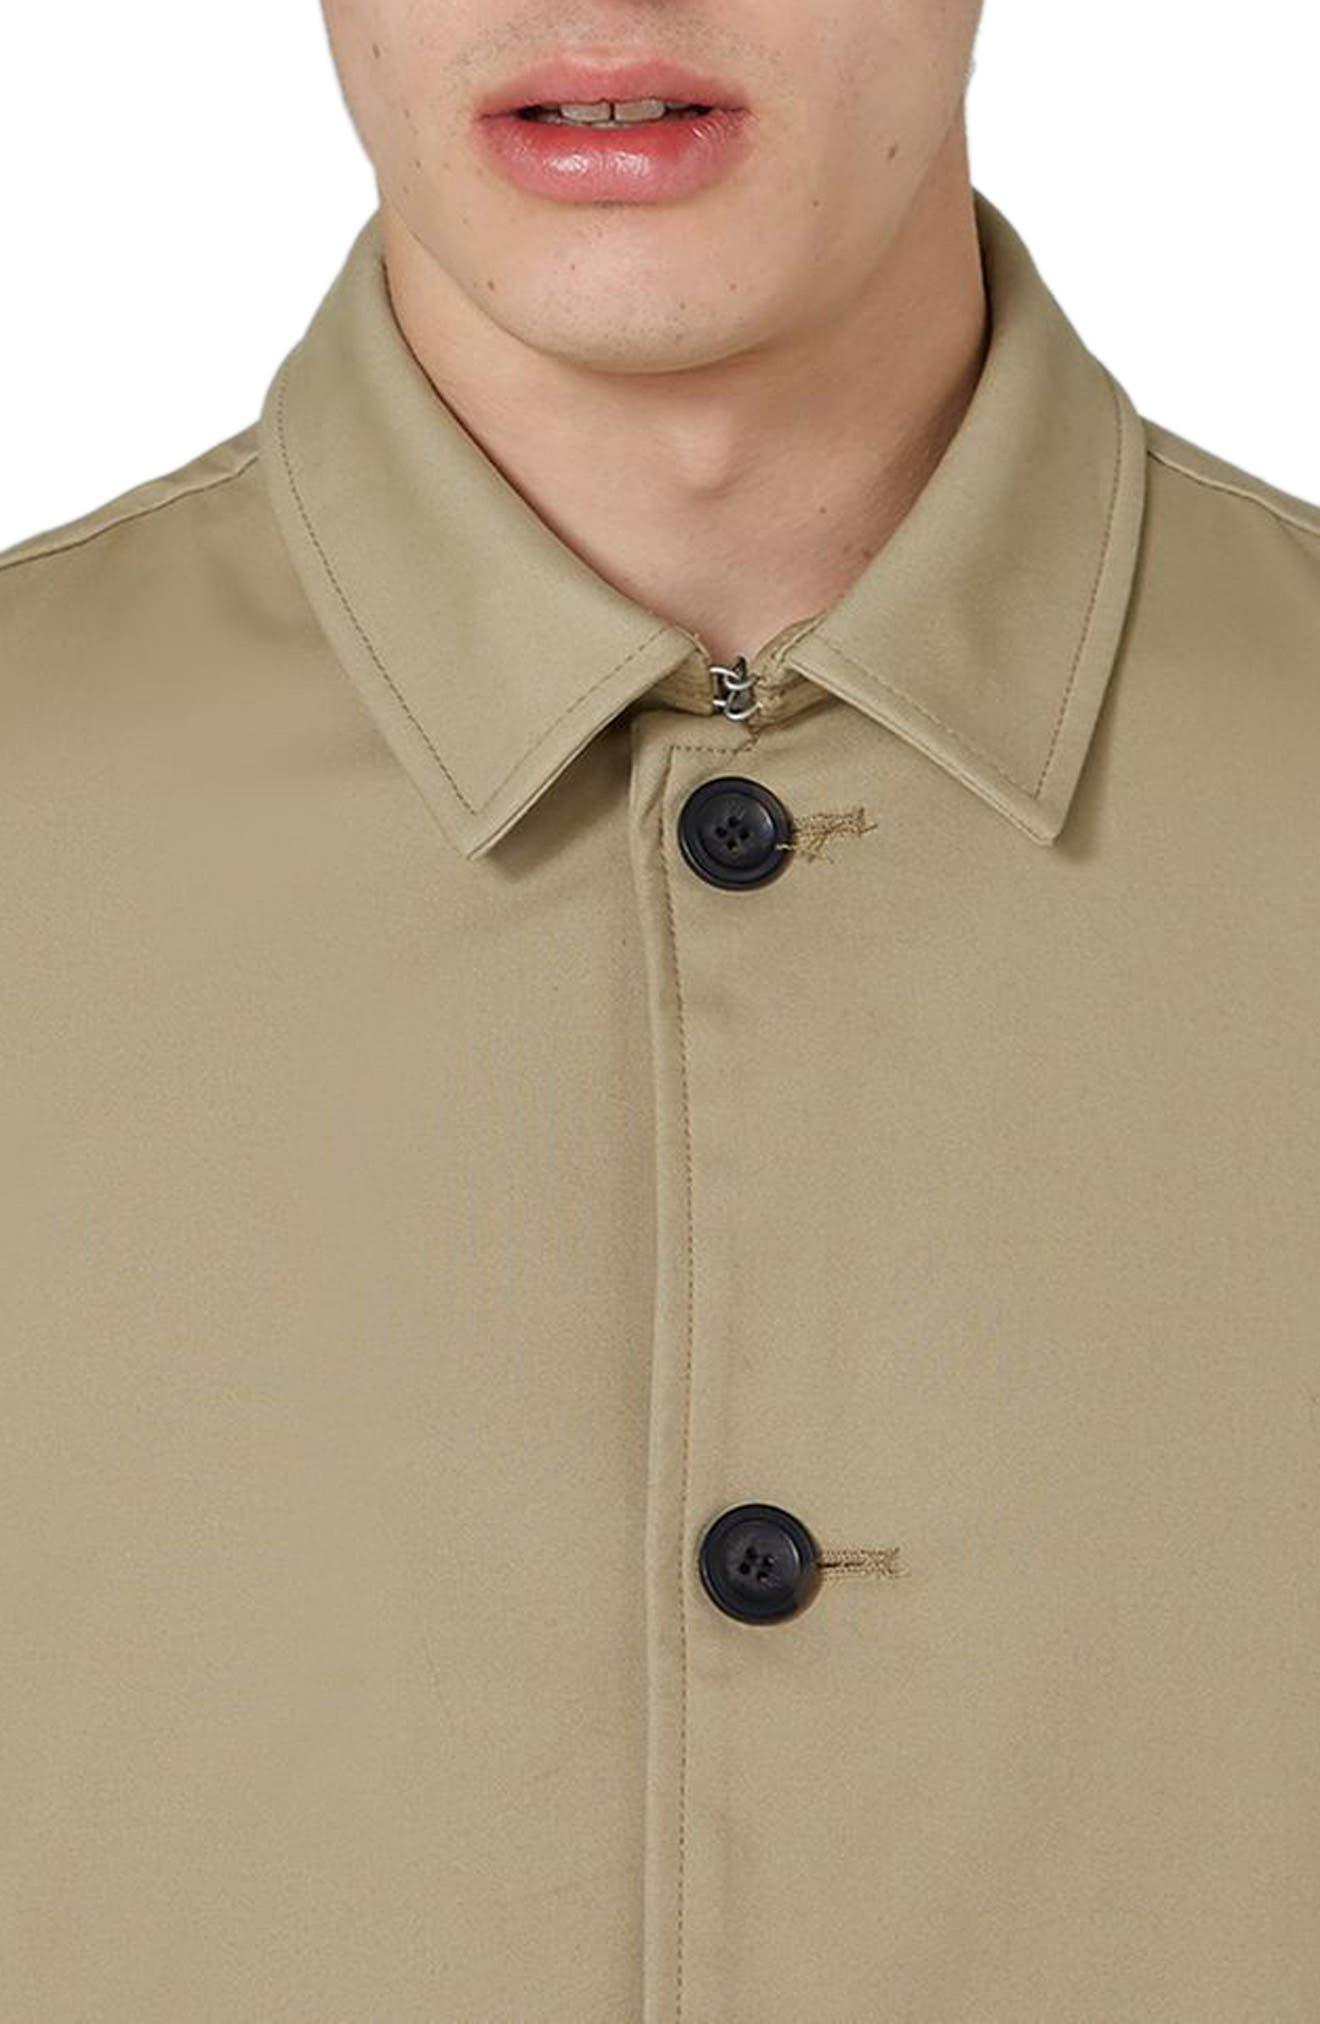 Mac Single Breasted Topcoat,                             Alternate thumbnail 3, color,                             250